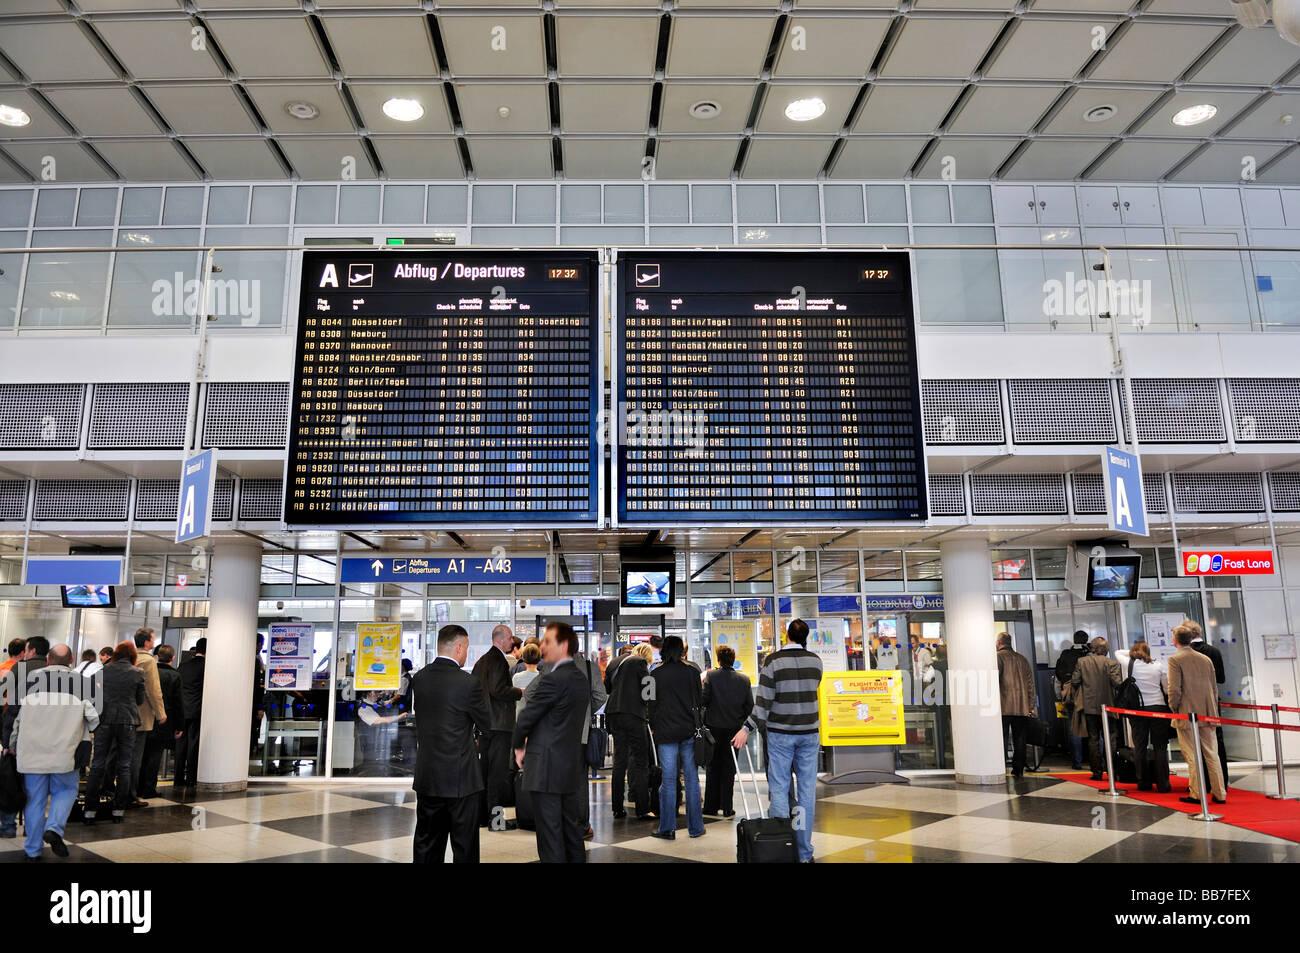 departure hall terminal 1 airport muc 2 munich bavaria germany stock photo 24137426 alamy. Black Bedroom Furniture Sets. Home Design Ideas